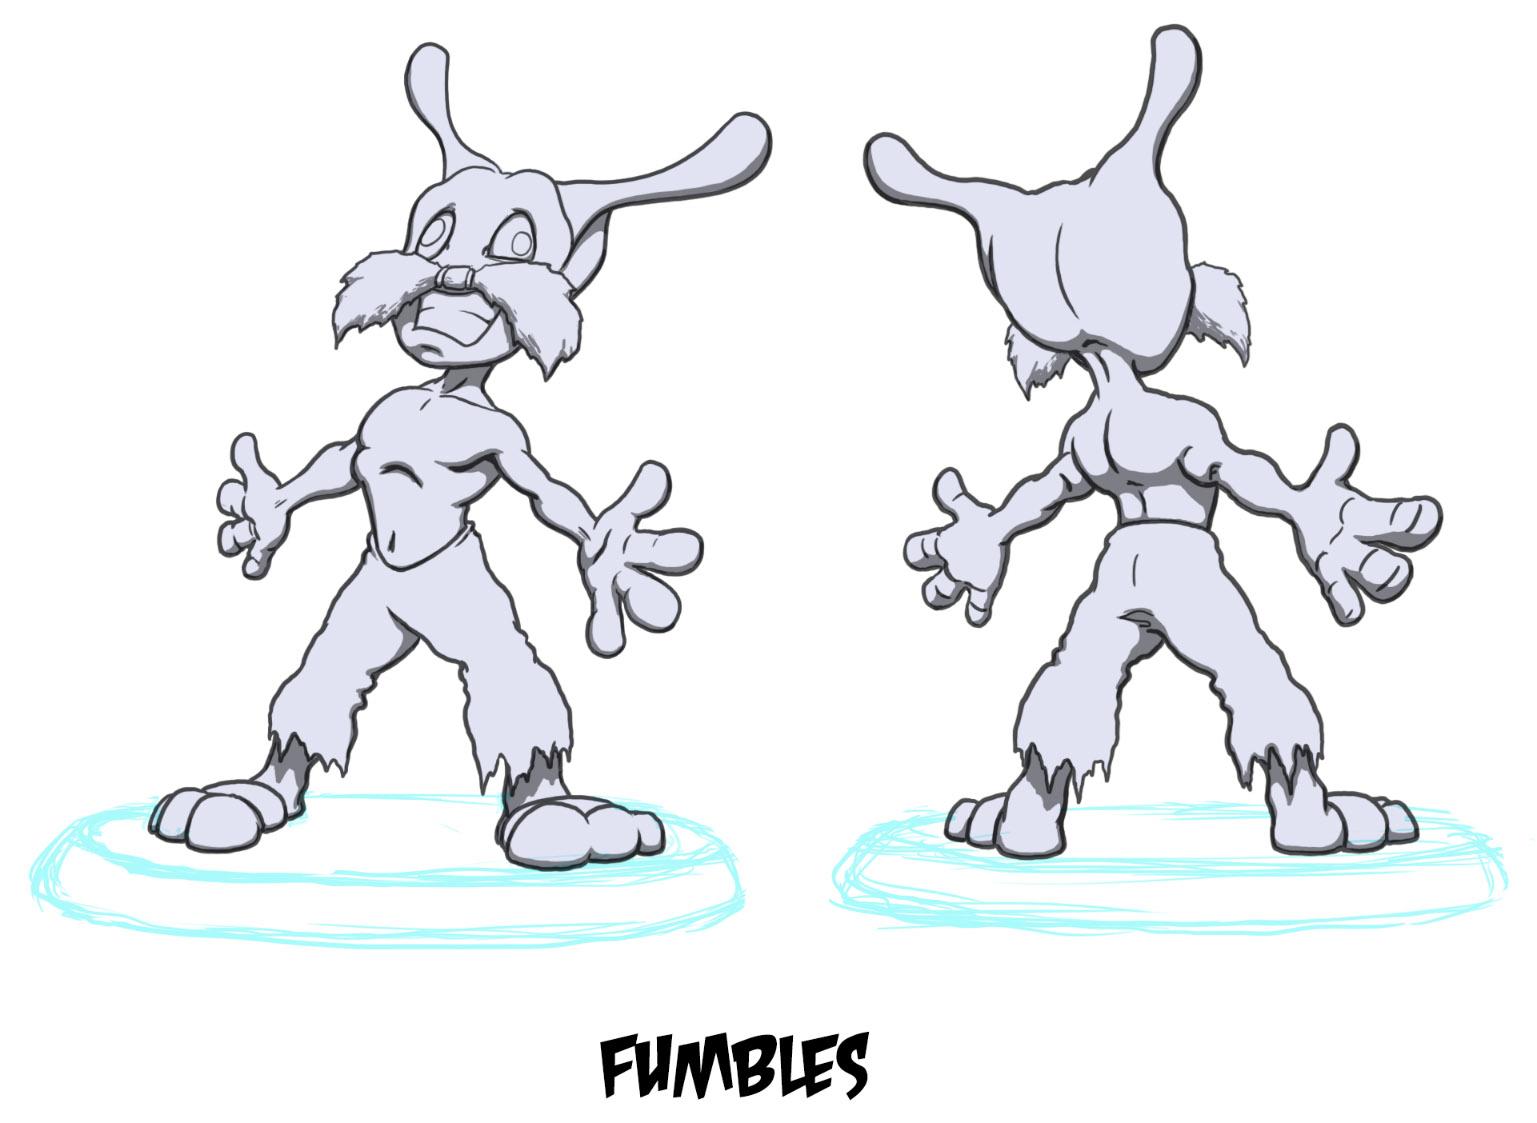 FumblesFig2.jpg